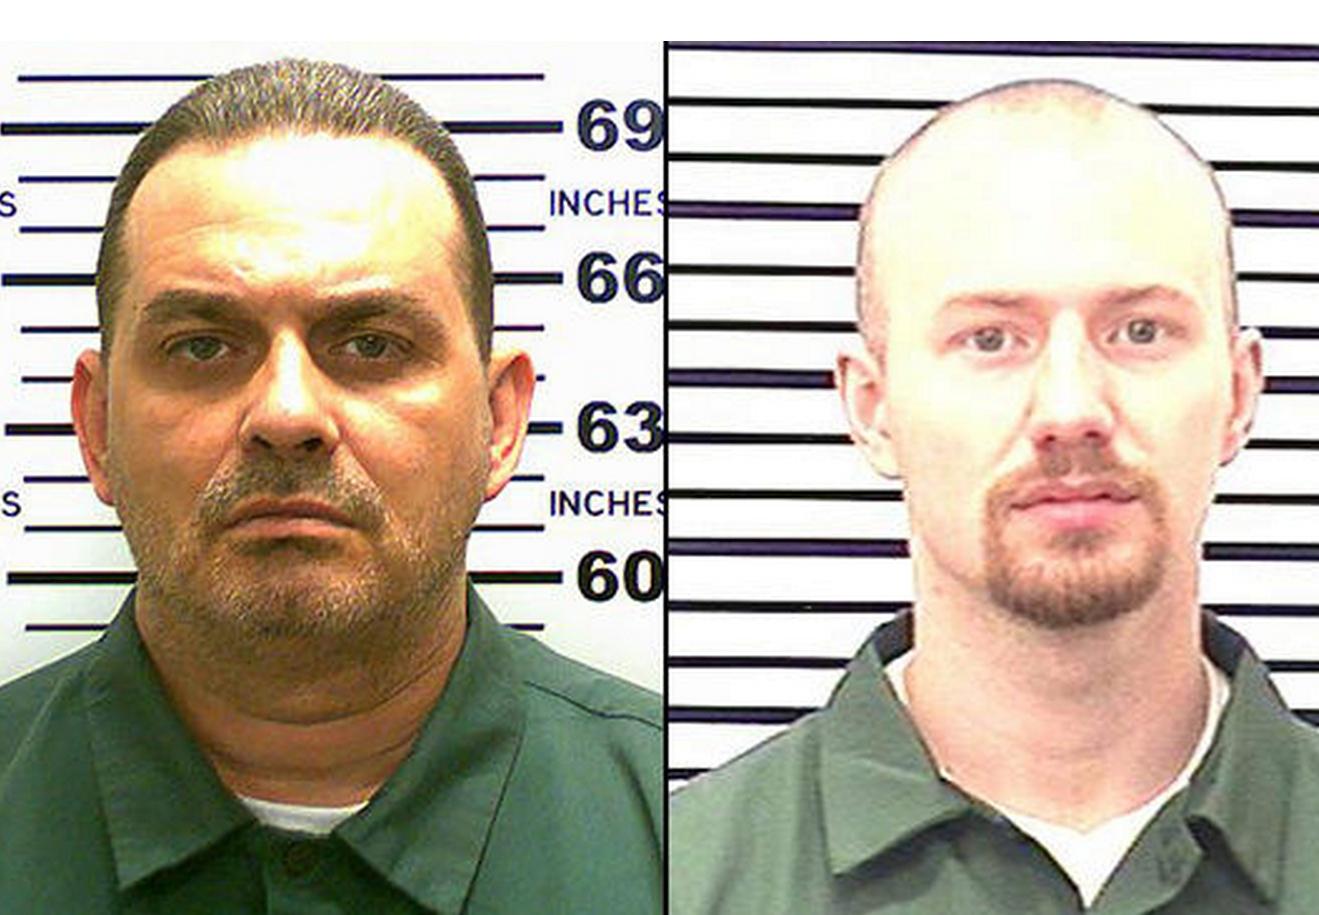 The search continues for escaped convicts David Sweat (l) and Richard Matt (r).